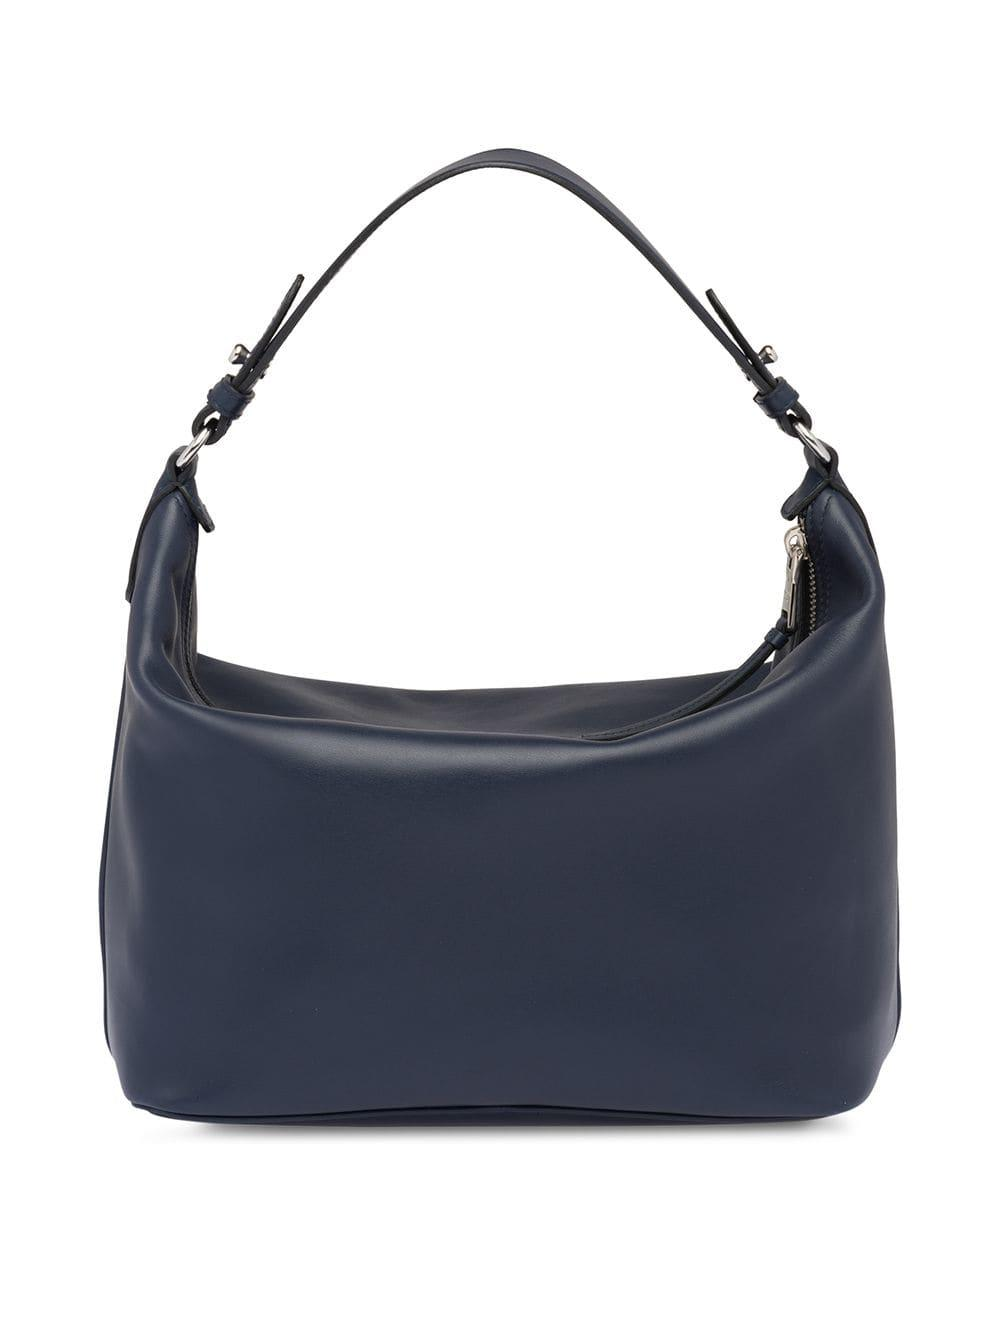 13af30e72bc9 Lyst - Prada Concept Bag in Blue